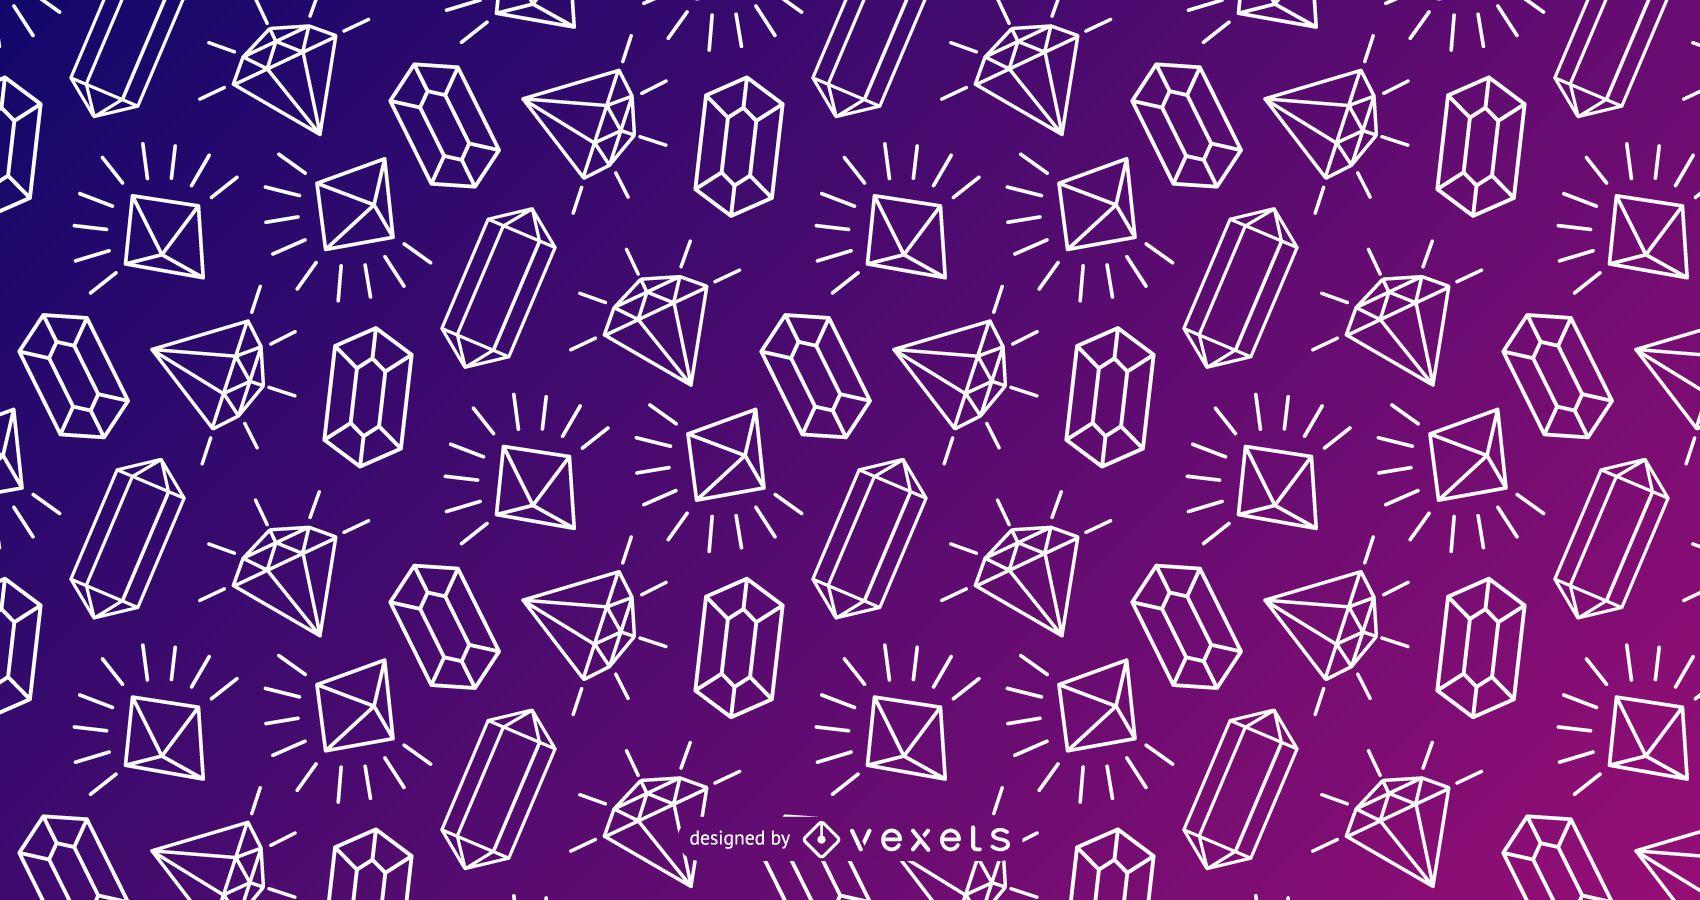 Crystal pattern stroke design